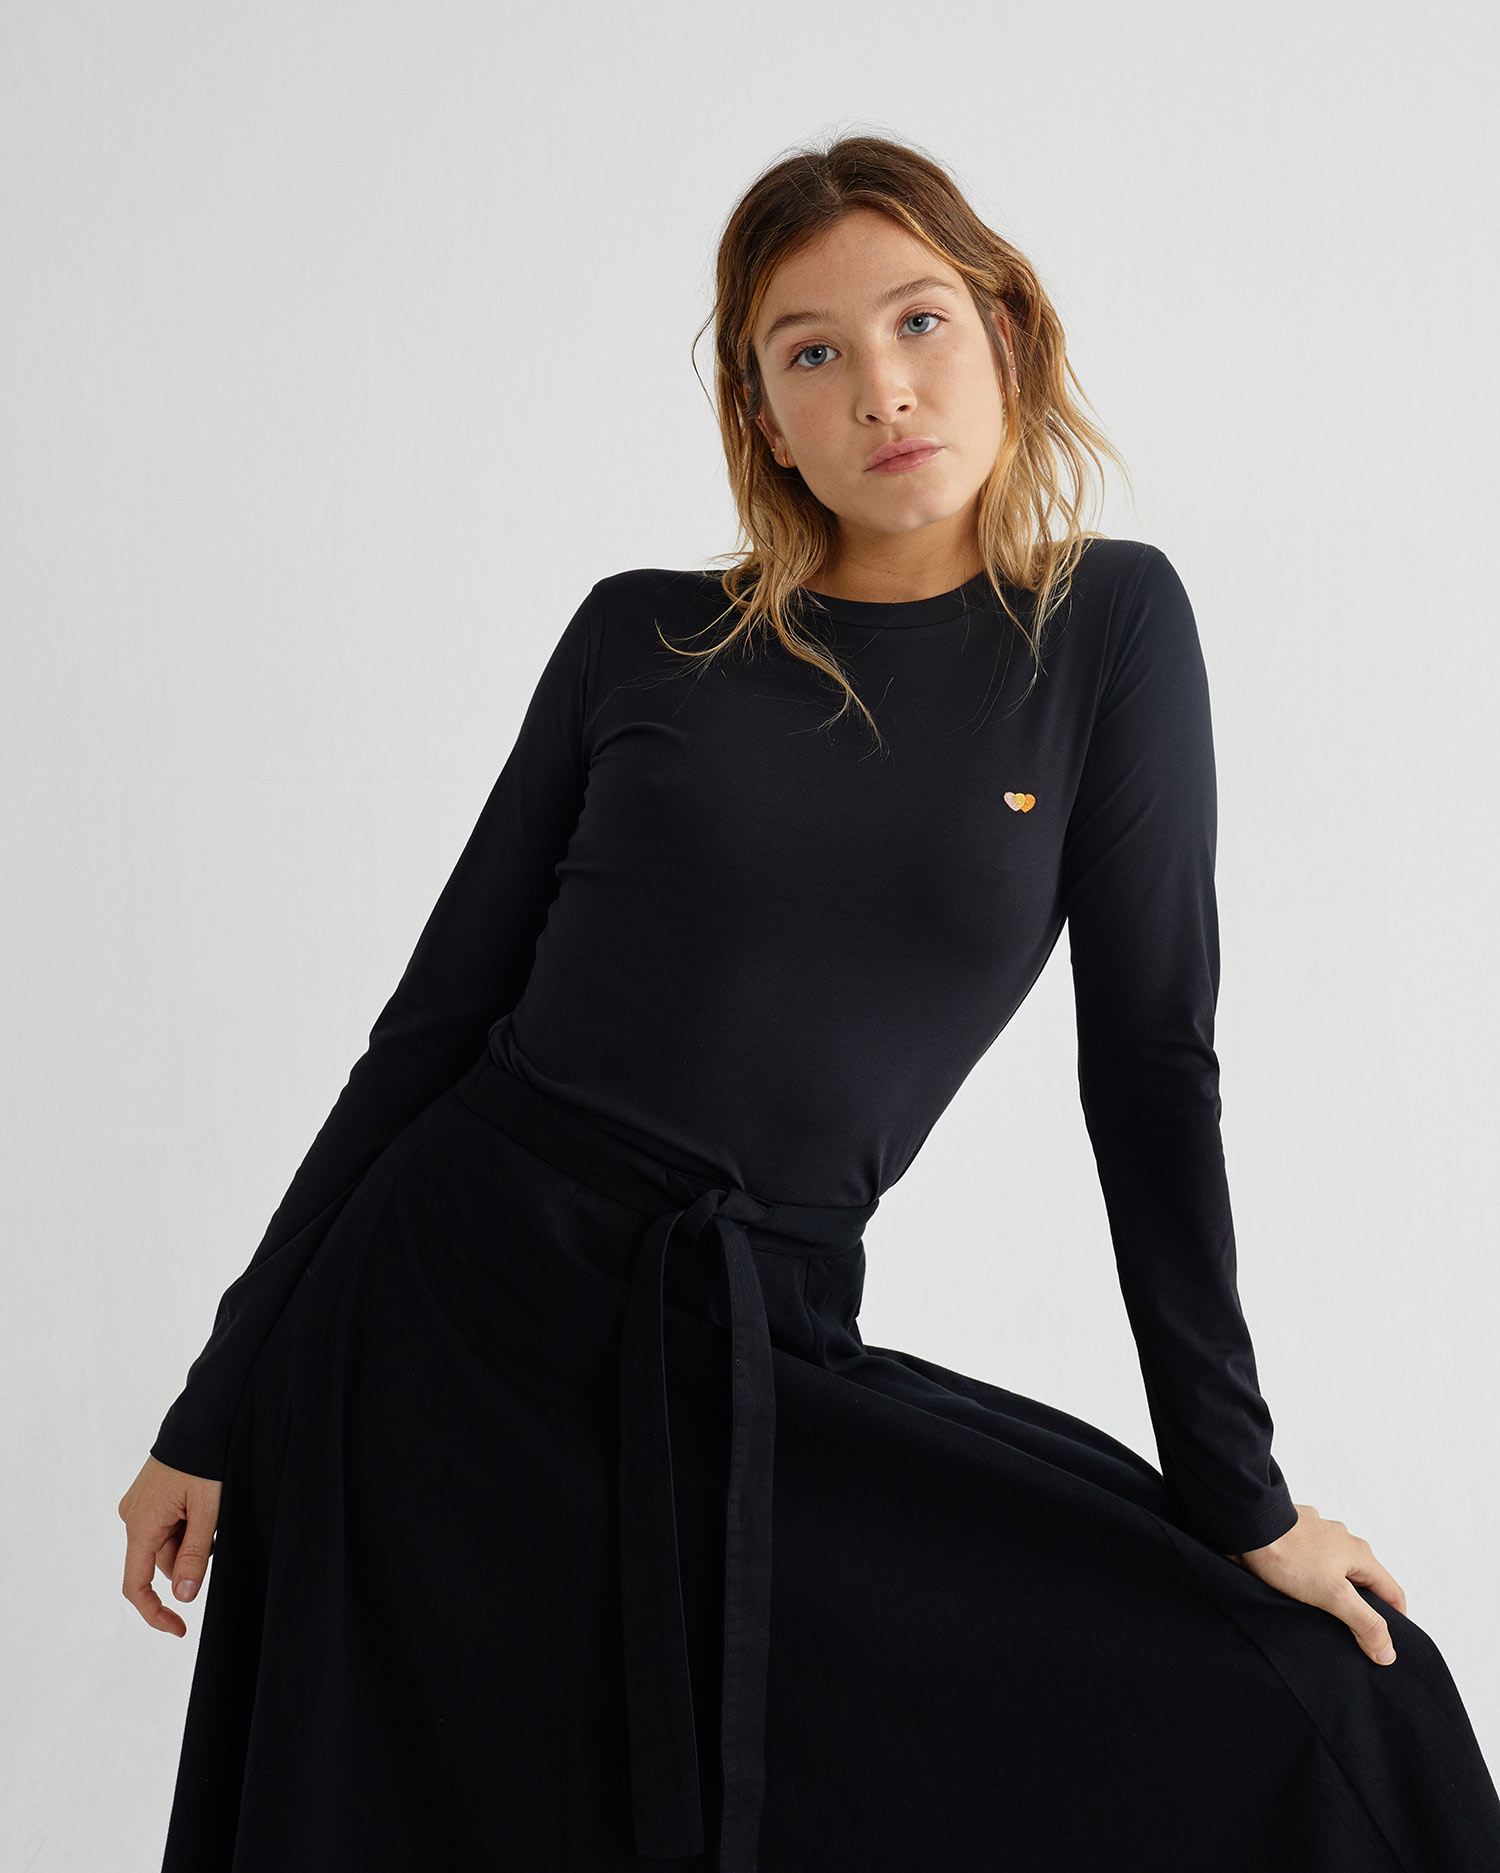 skirt black tauret, damen, thinking mu